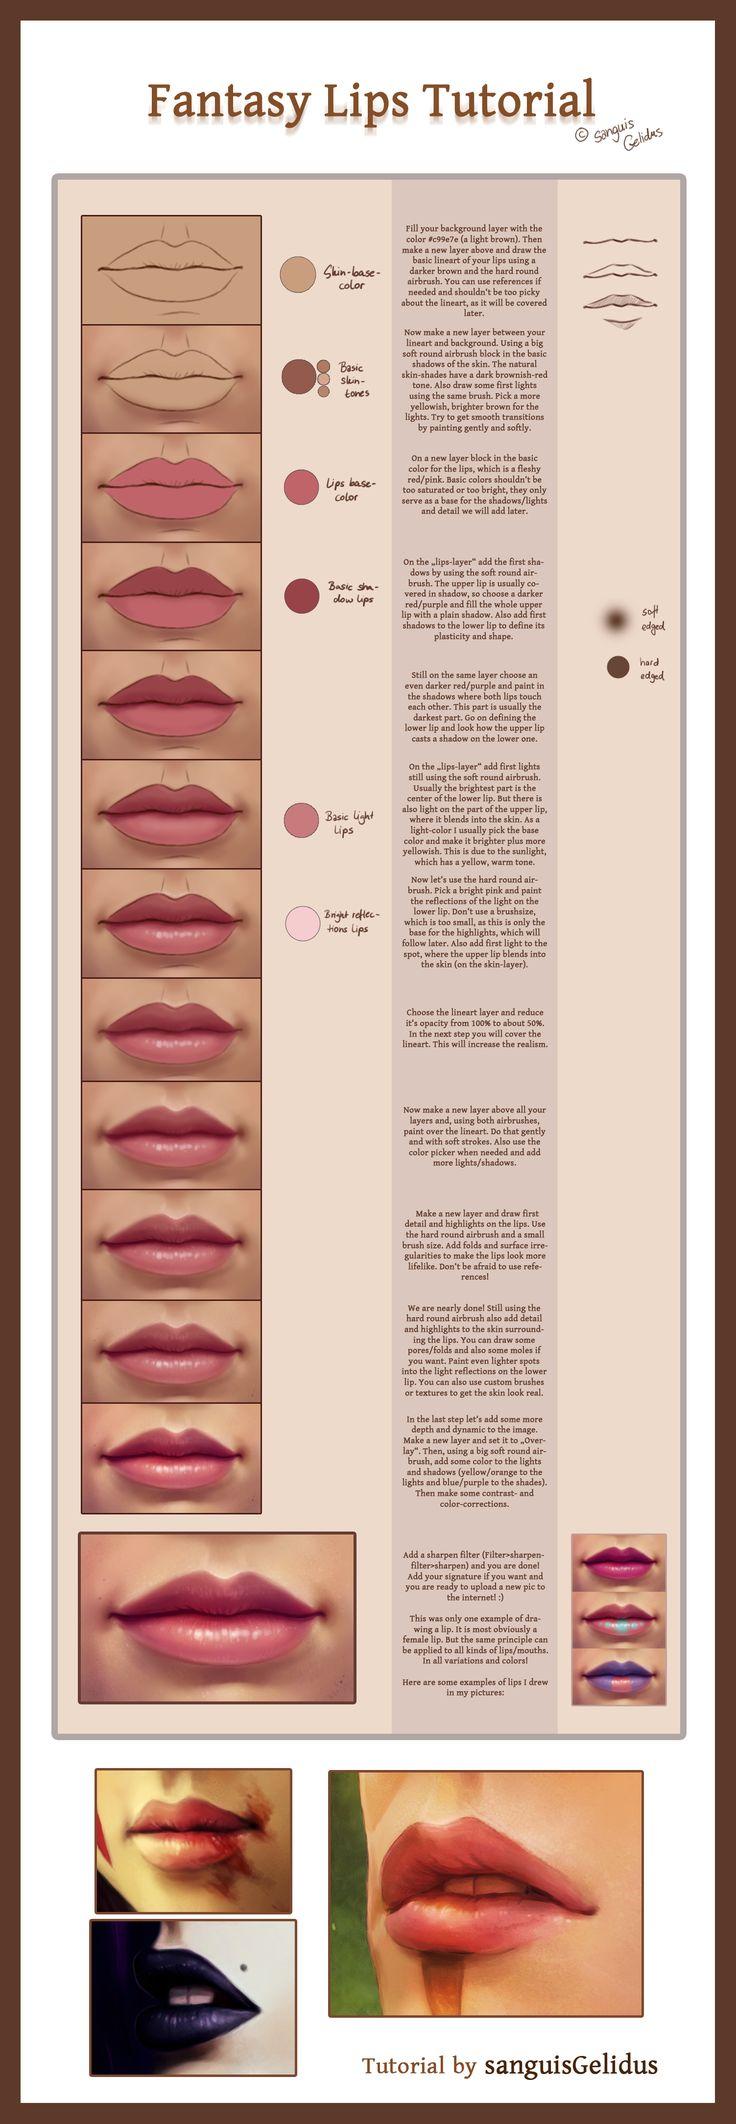 fantasy_lips_tutorial_by_sanguisgelidus-d5965m3.jpg (1503?4338) via PinCG.com